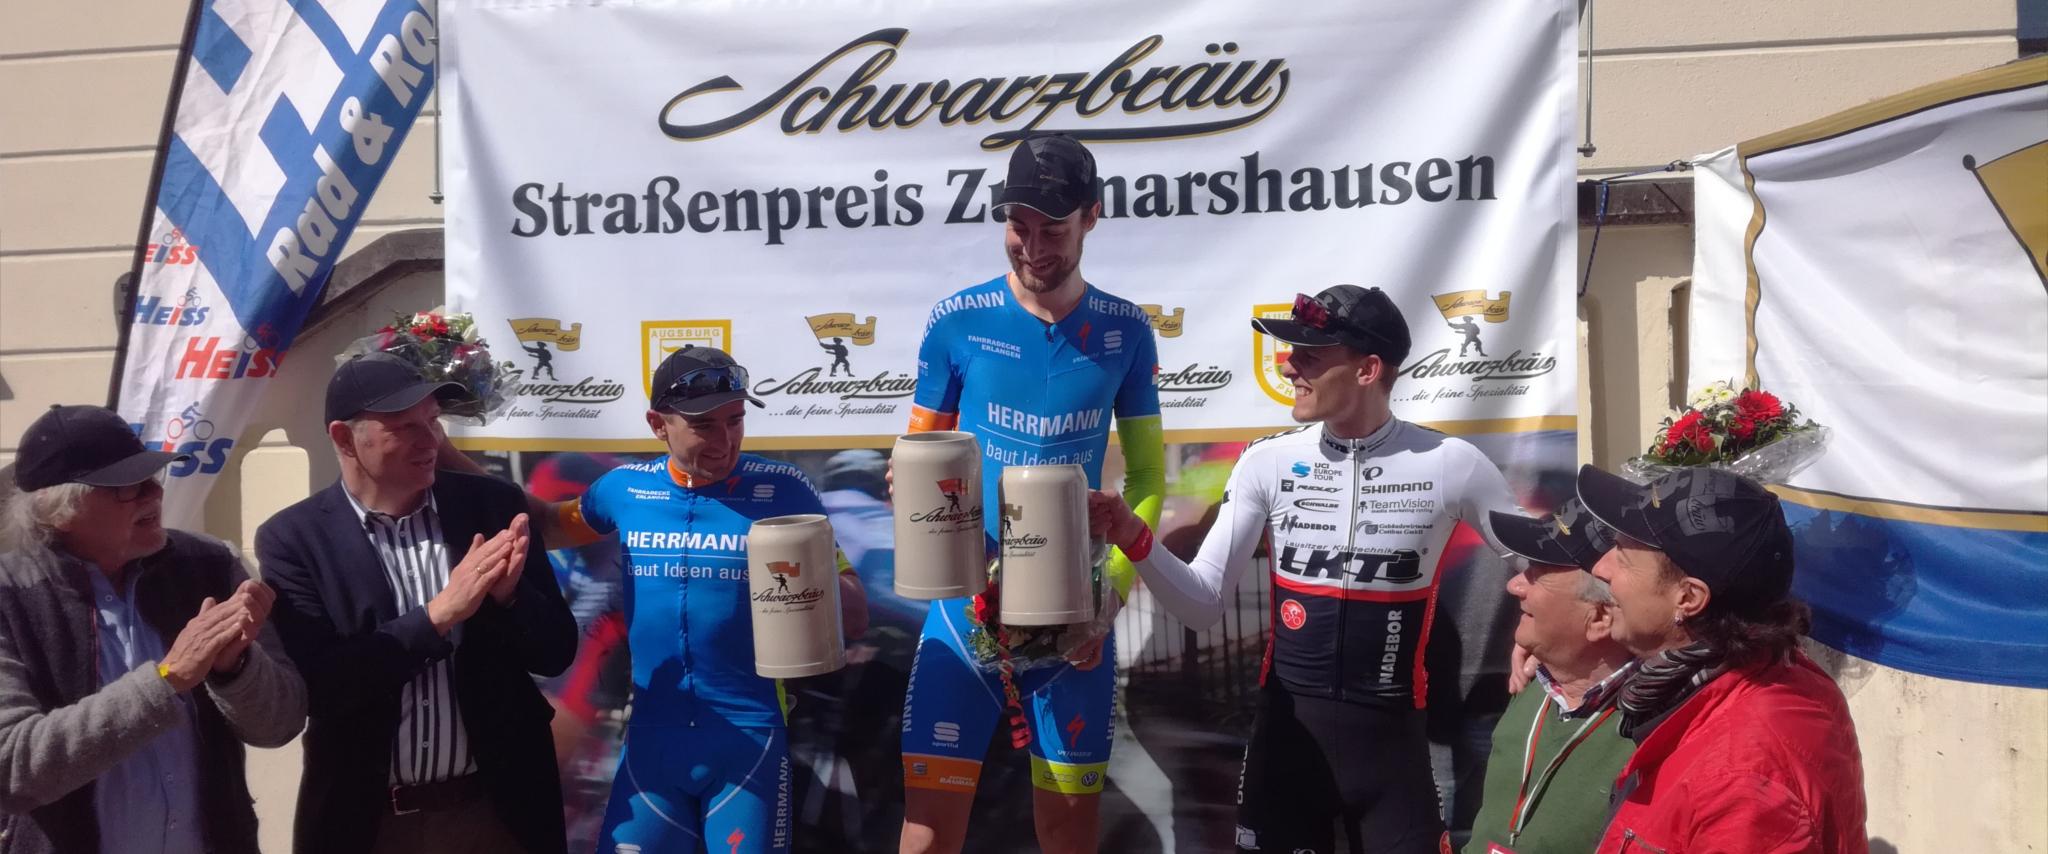 Schwarzbräupreis 2018